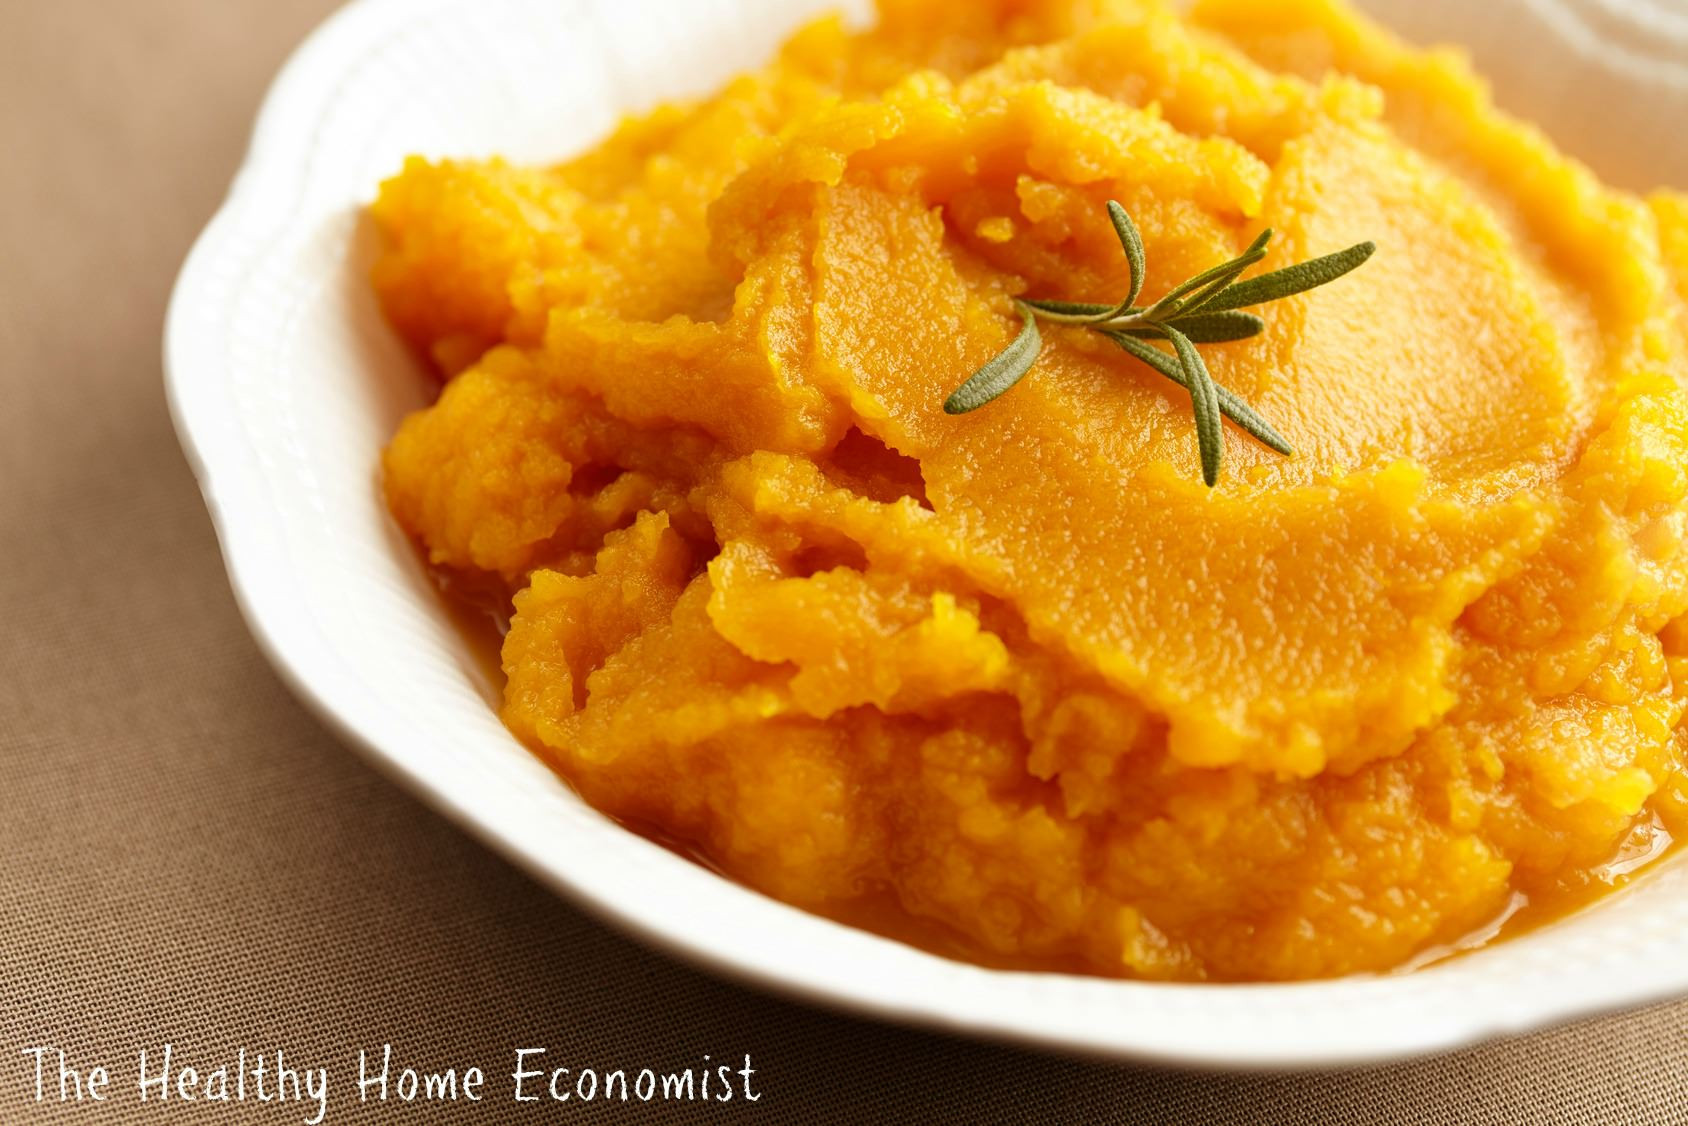 Pumpkin Puree Recipes Healthy  Homemade Pumpkin Puree Recipe Video Demo